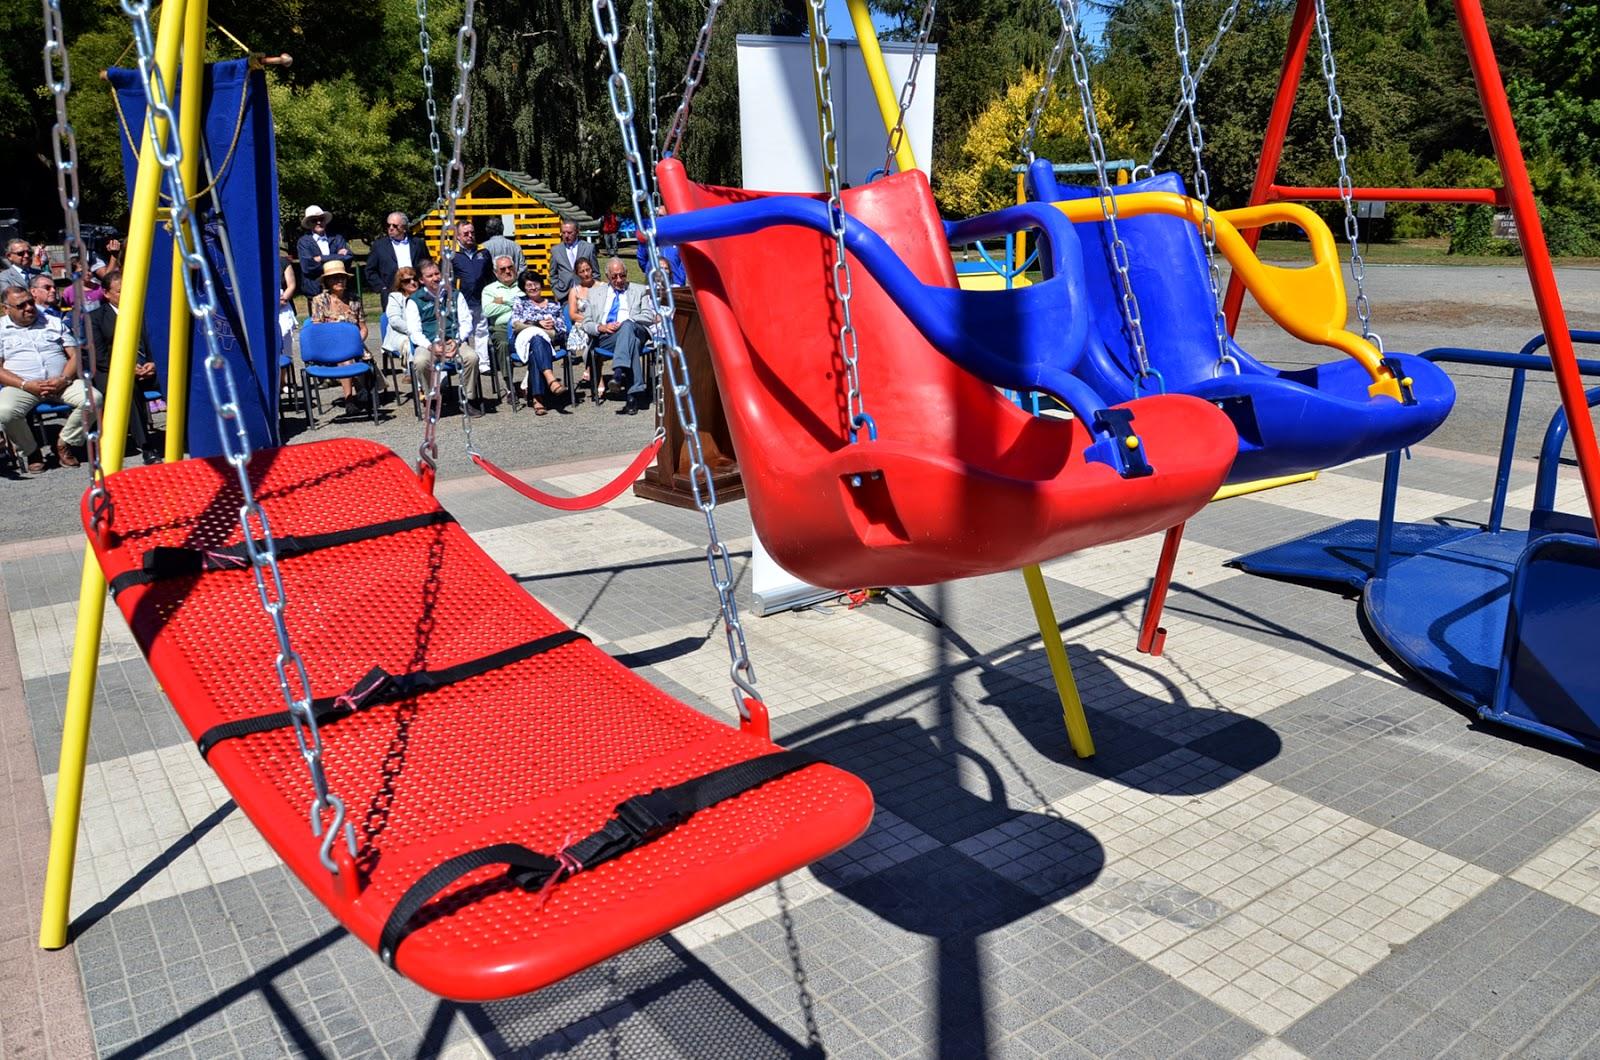 Rotary Club Temuco Norte Dono A Municipio Juegos Infantiles Para